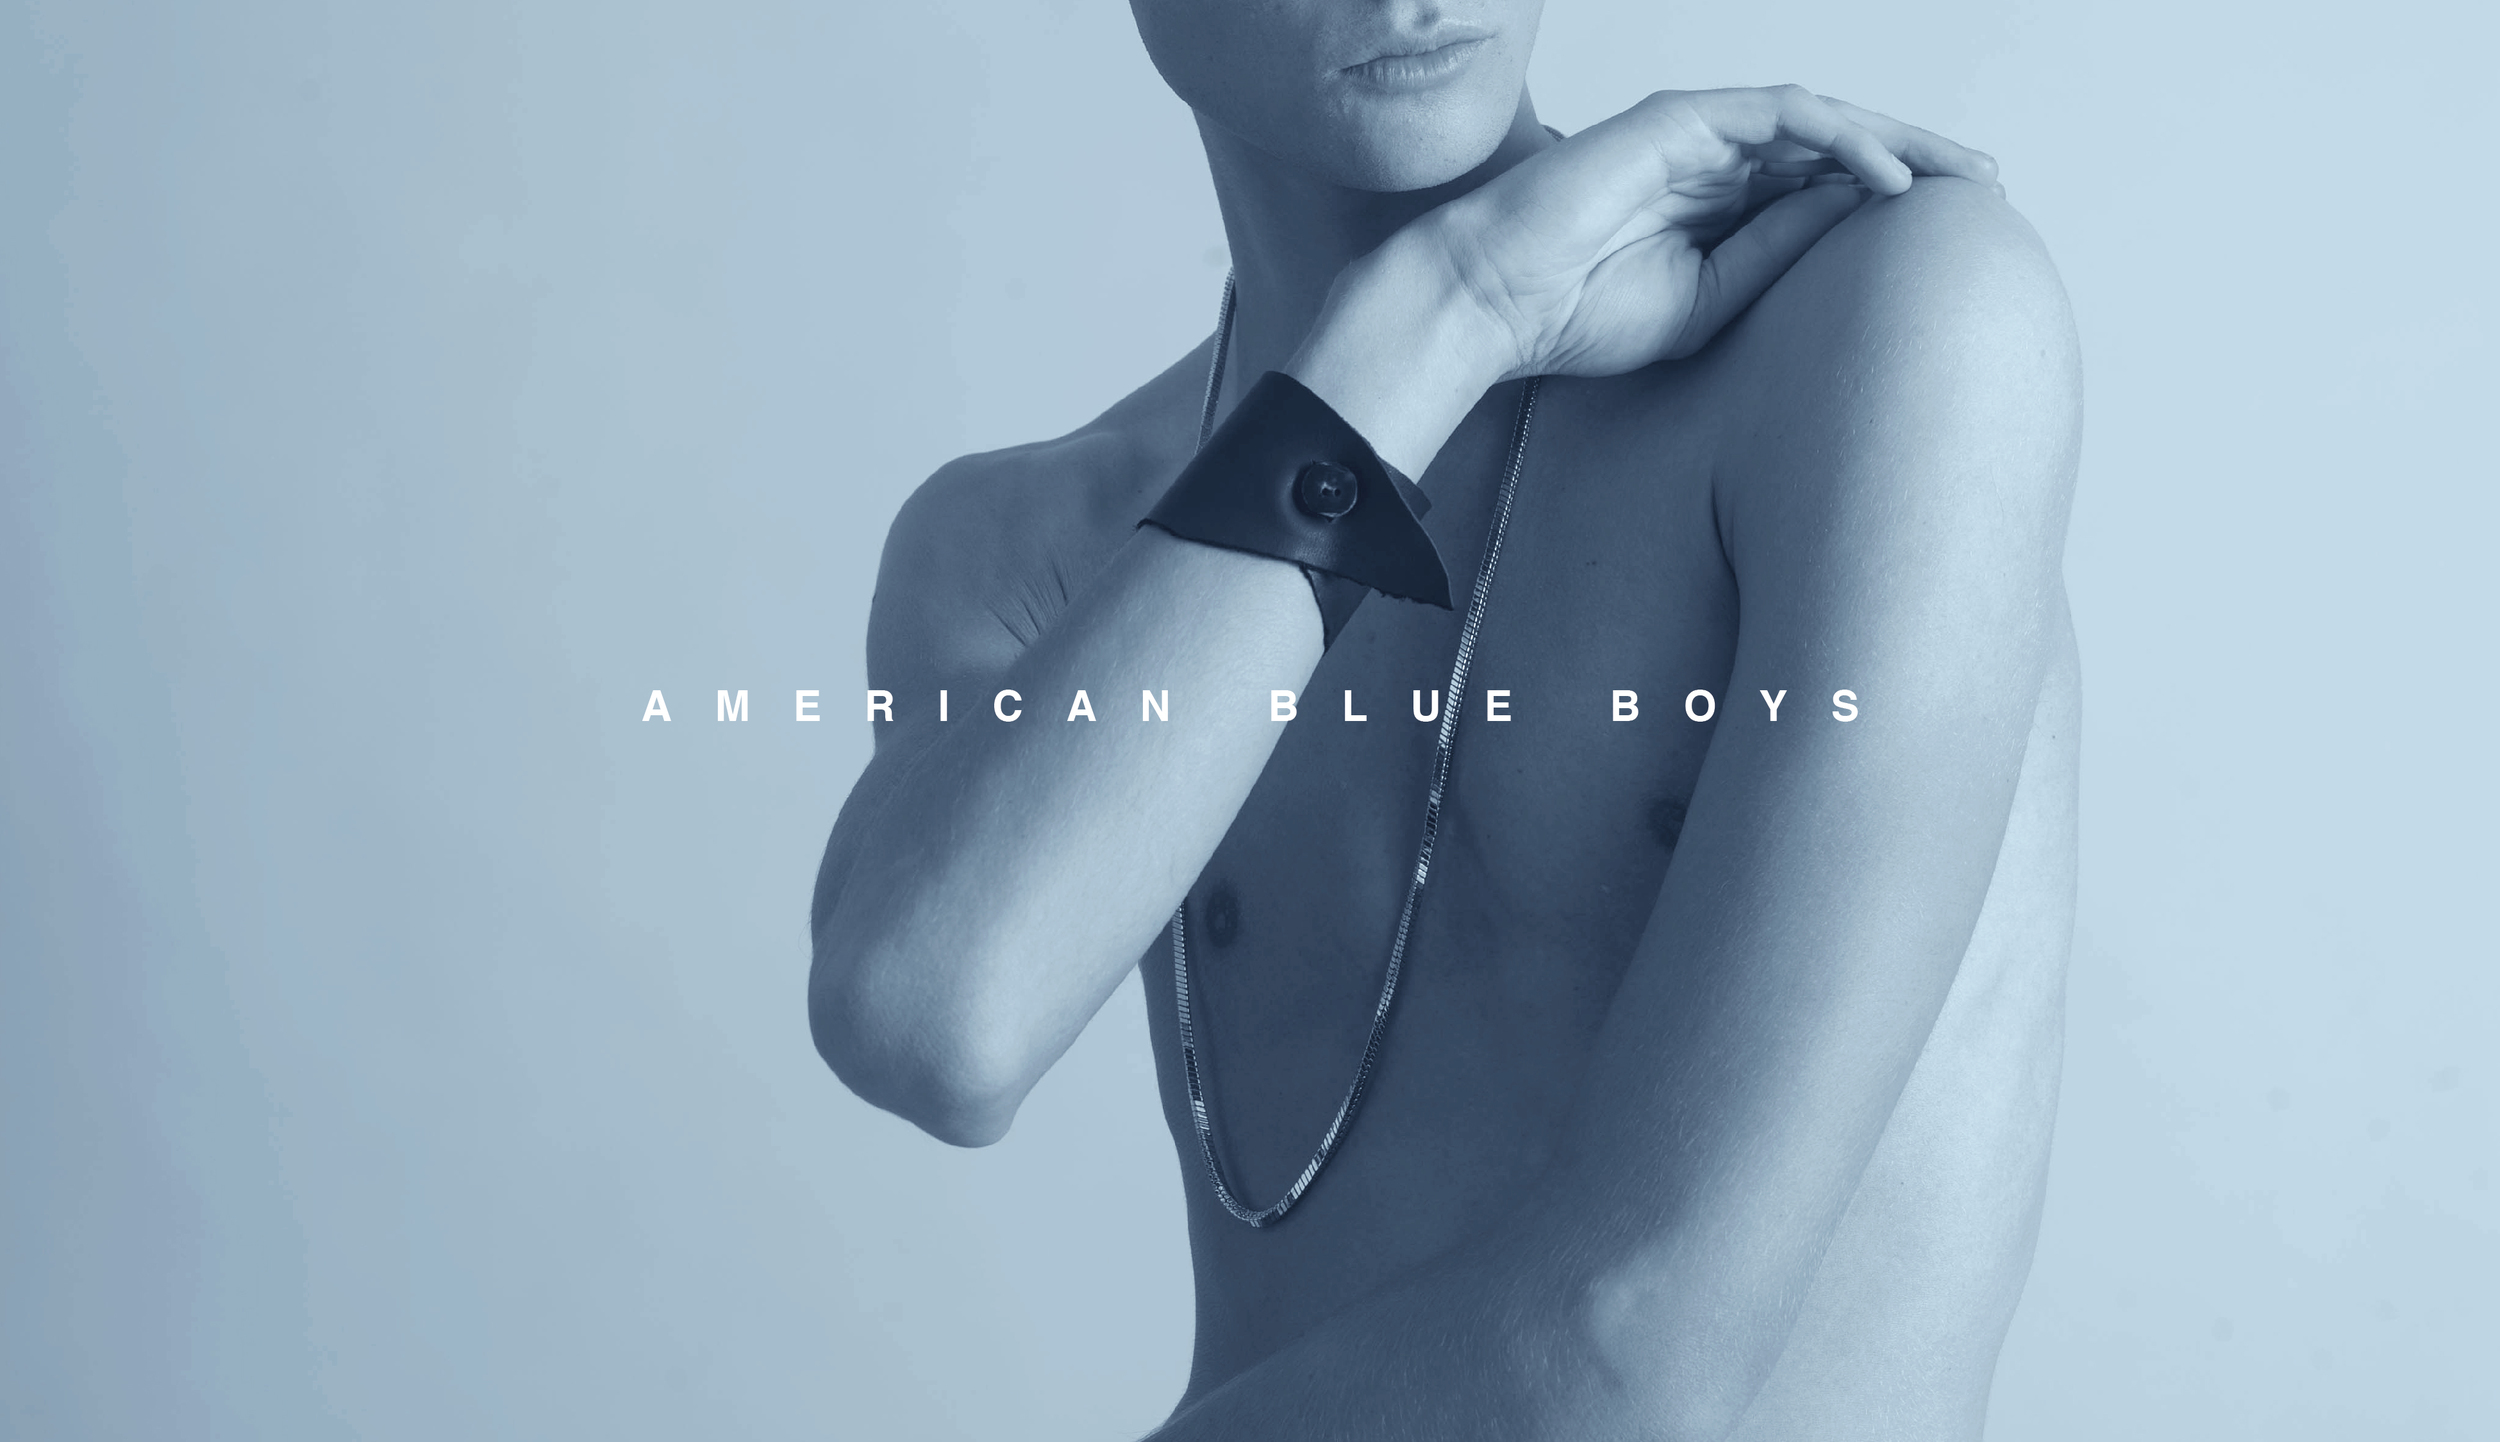 american_blue_boys-01.jpg